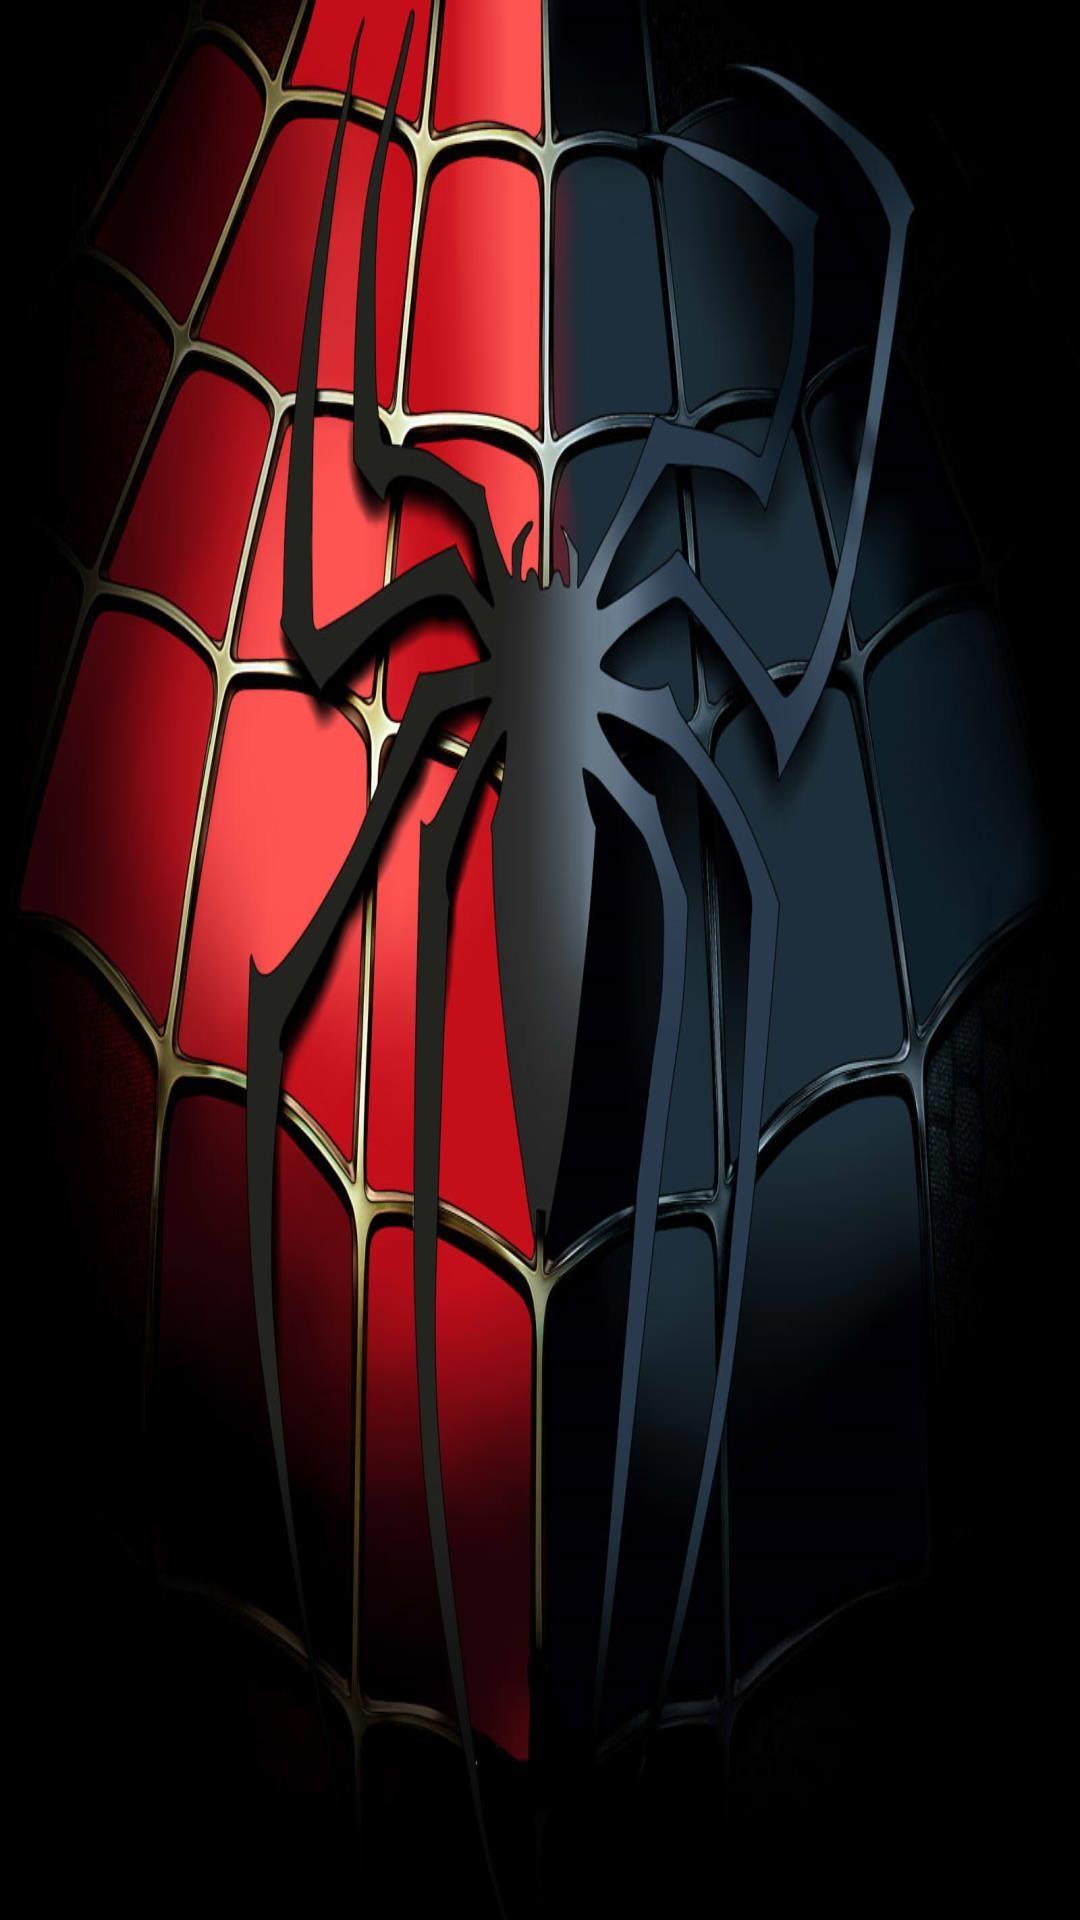 Amazing Wallpaper Logo Spiderman - 1004483-spiderman-logo-wallpaper-1080x1920-for-iphone-7  Best Photo Reference_29049.jpg